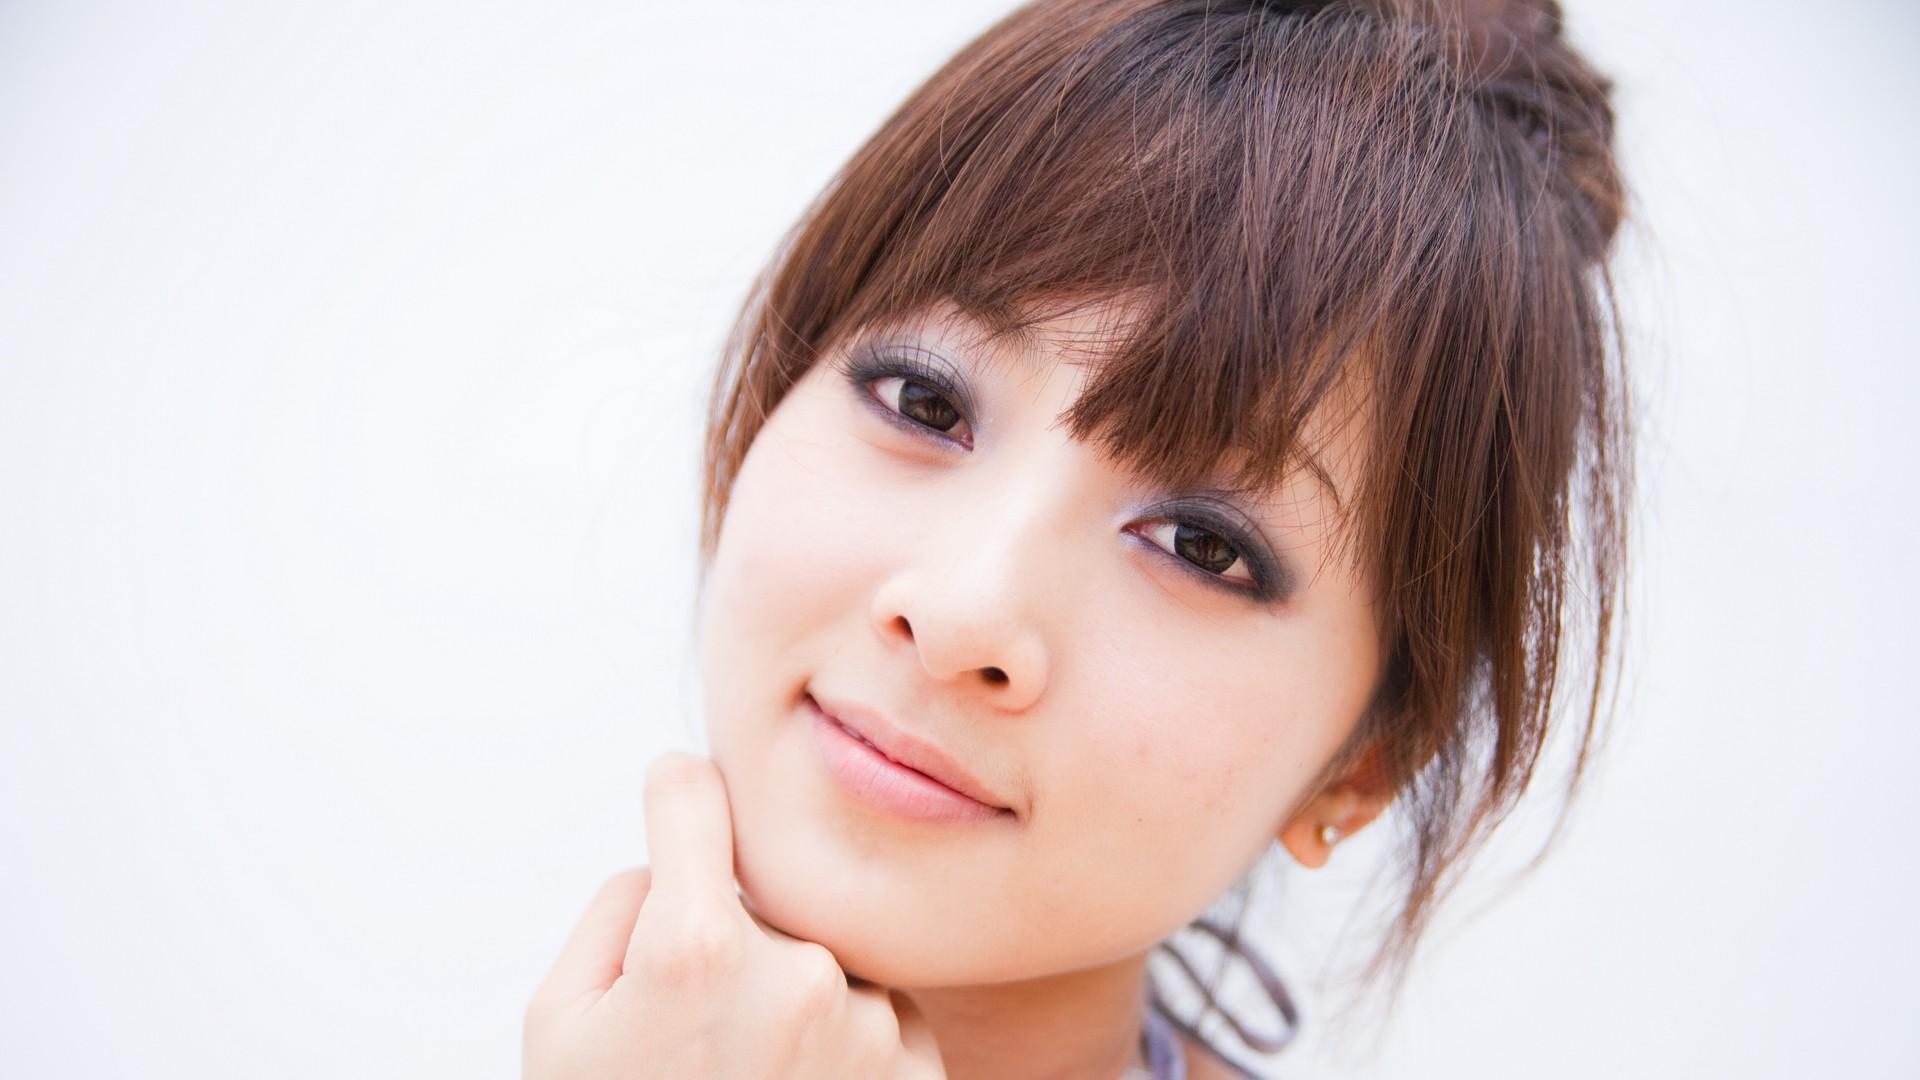 pretty mikako zhang 36186